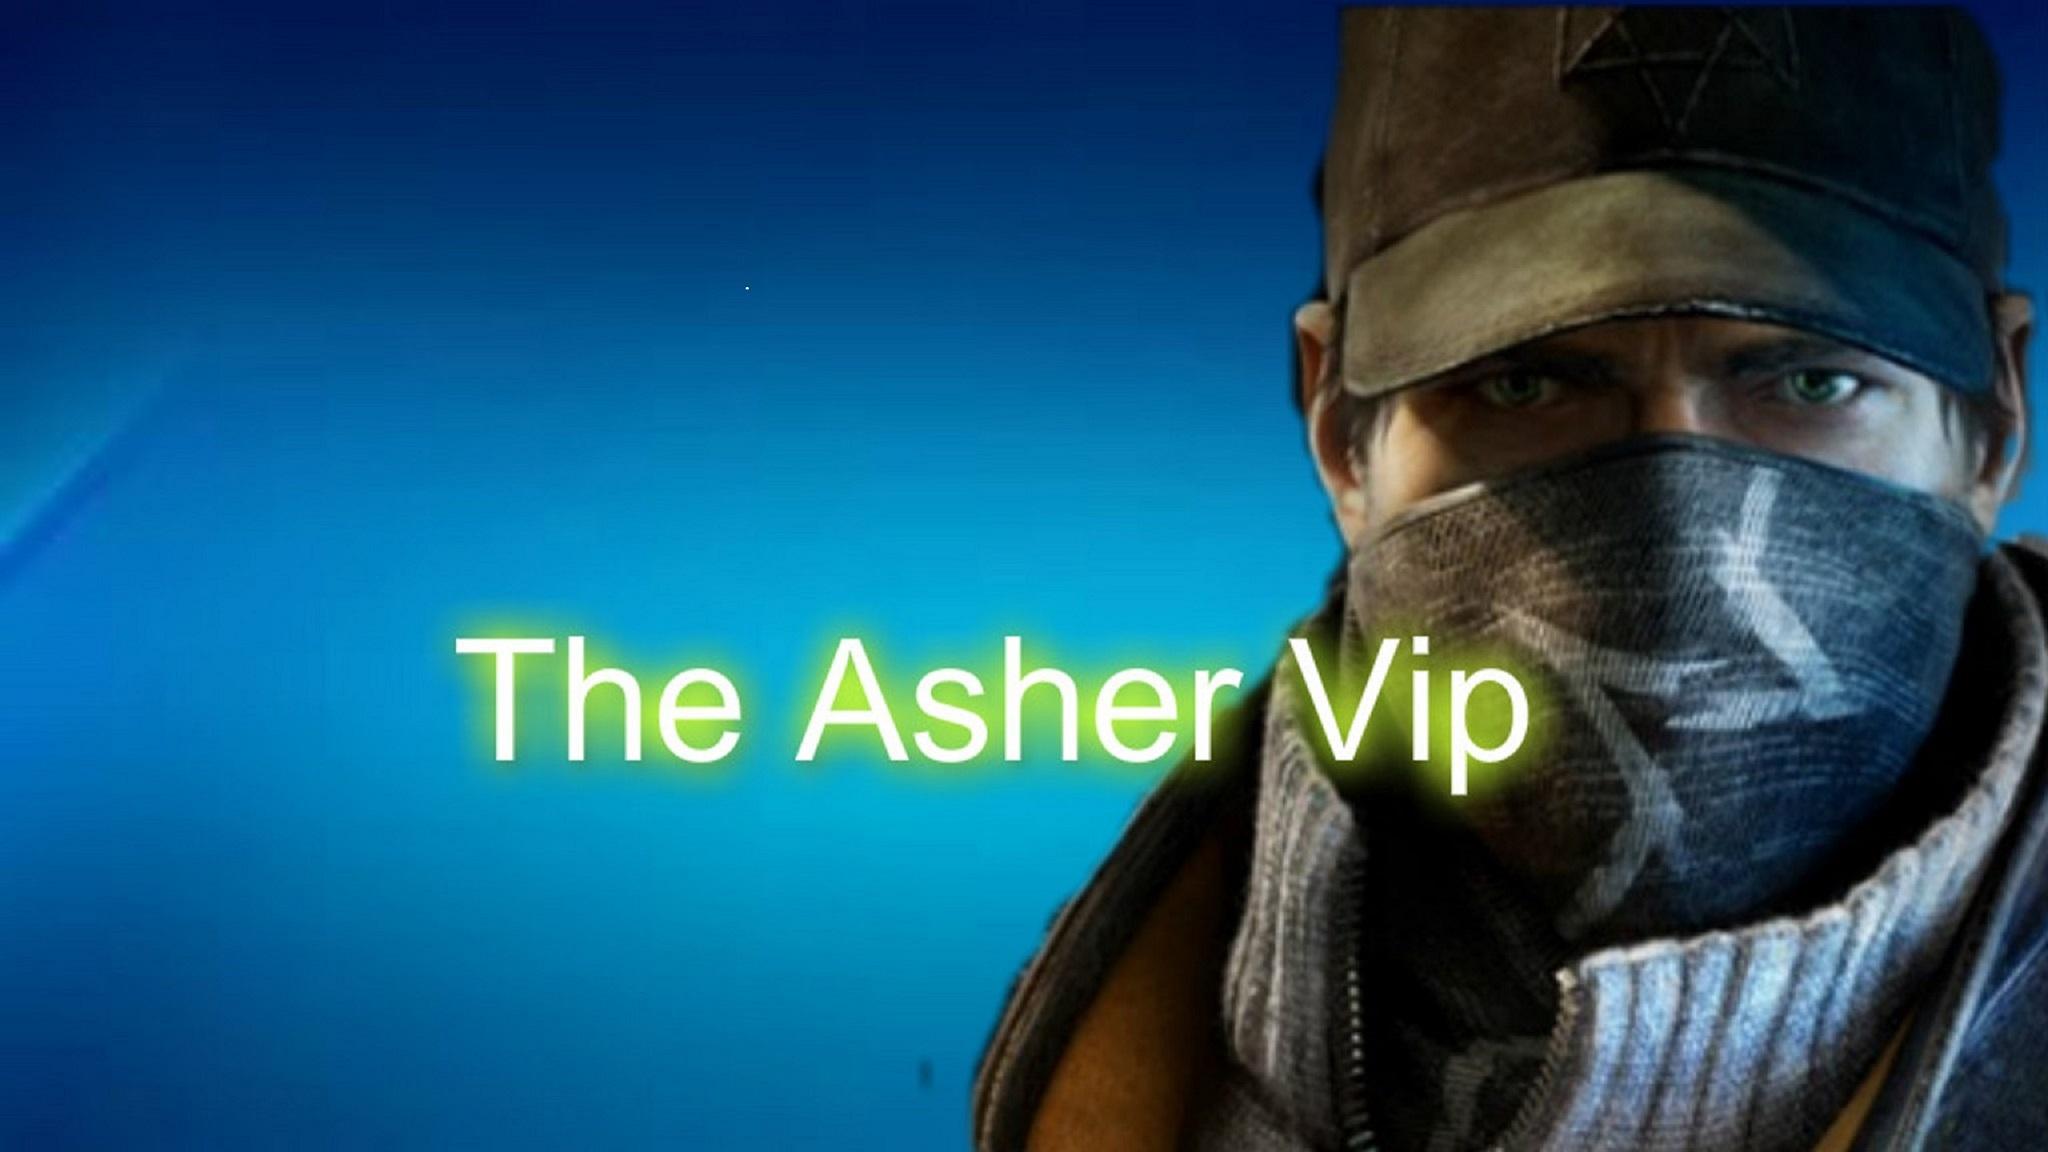 TheAsherVip